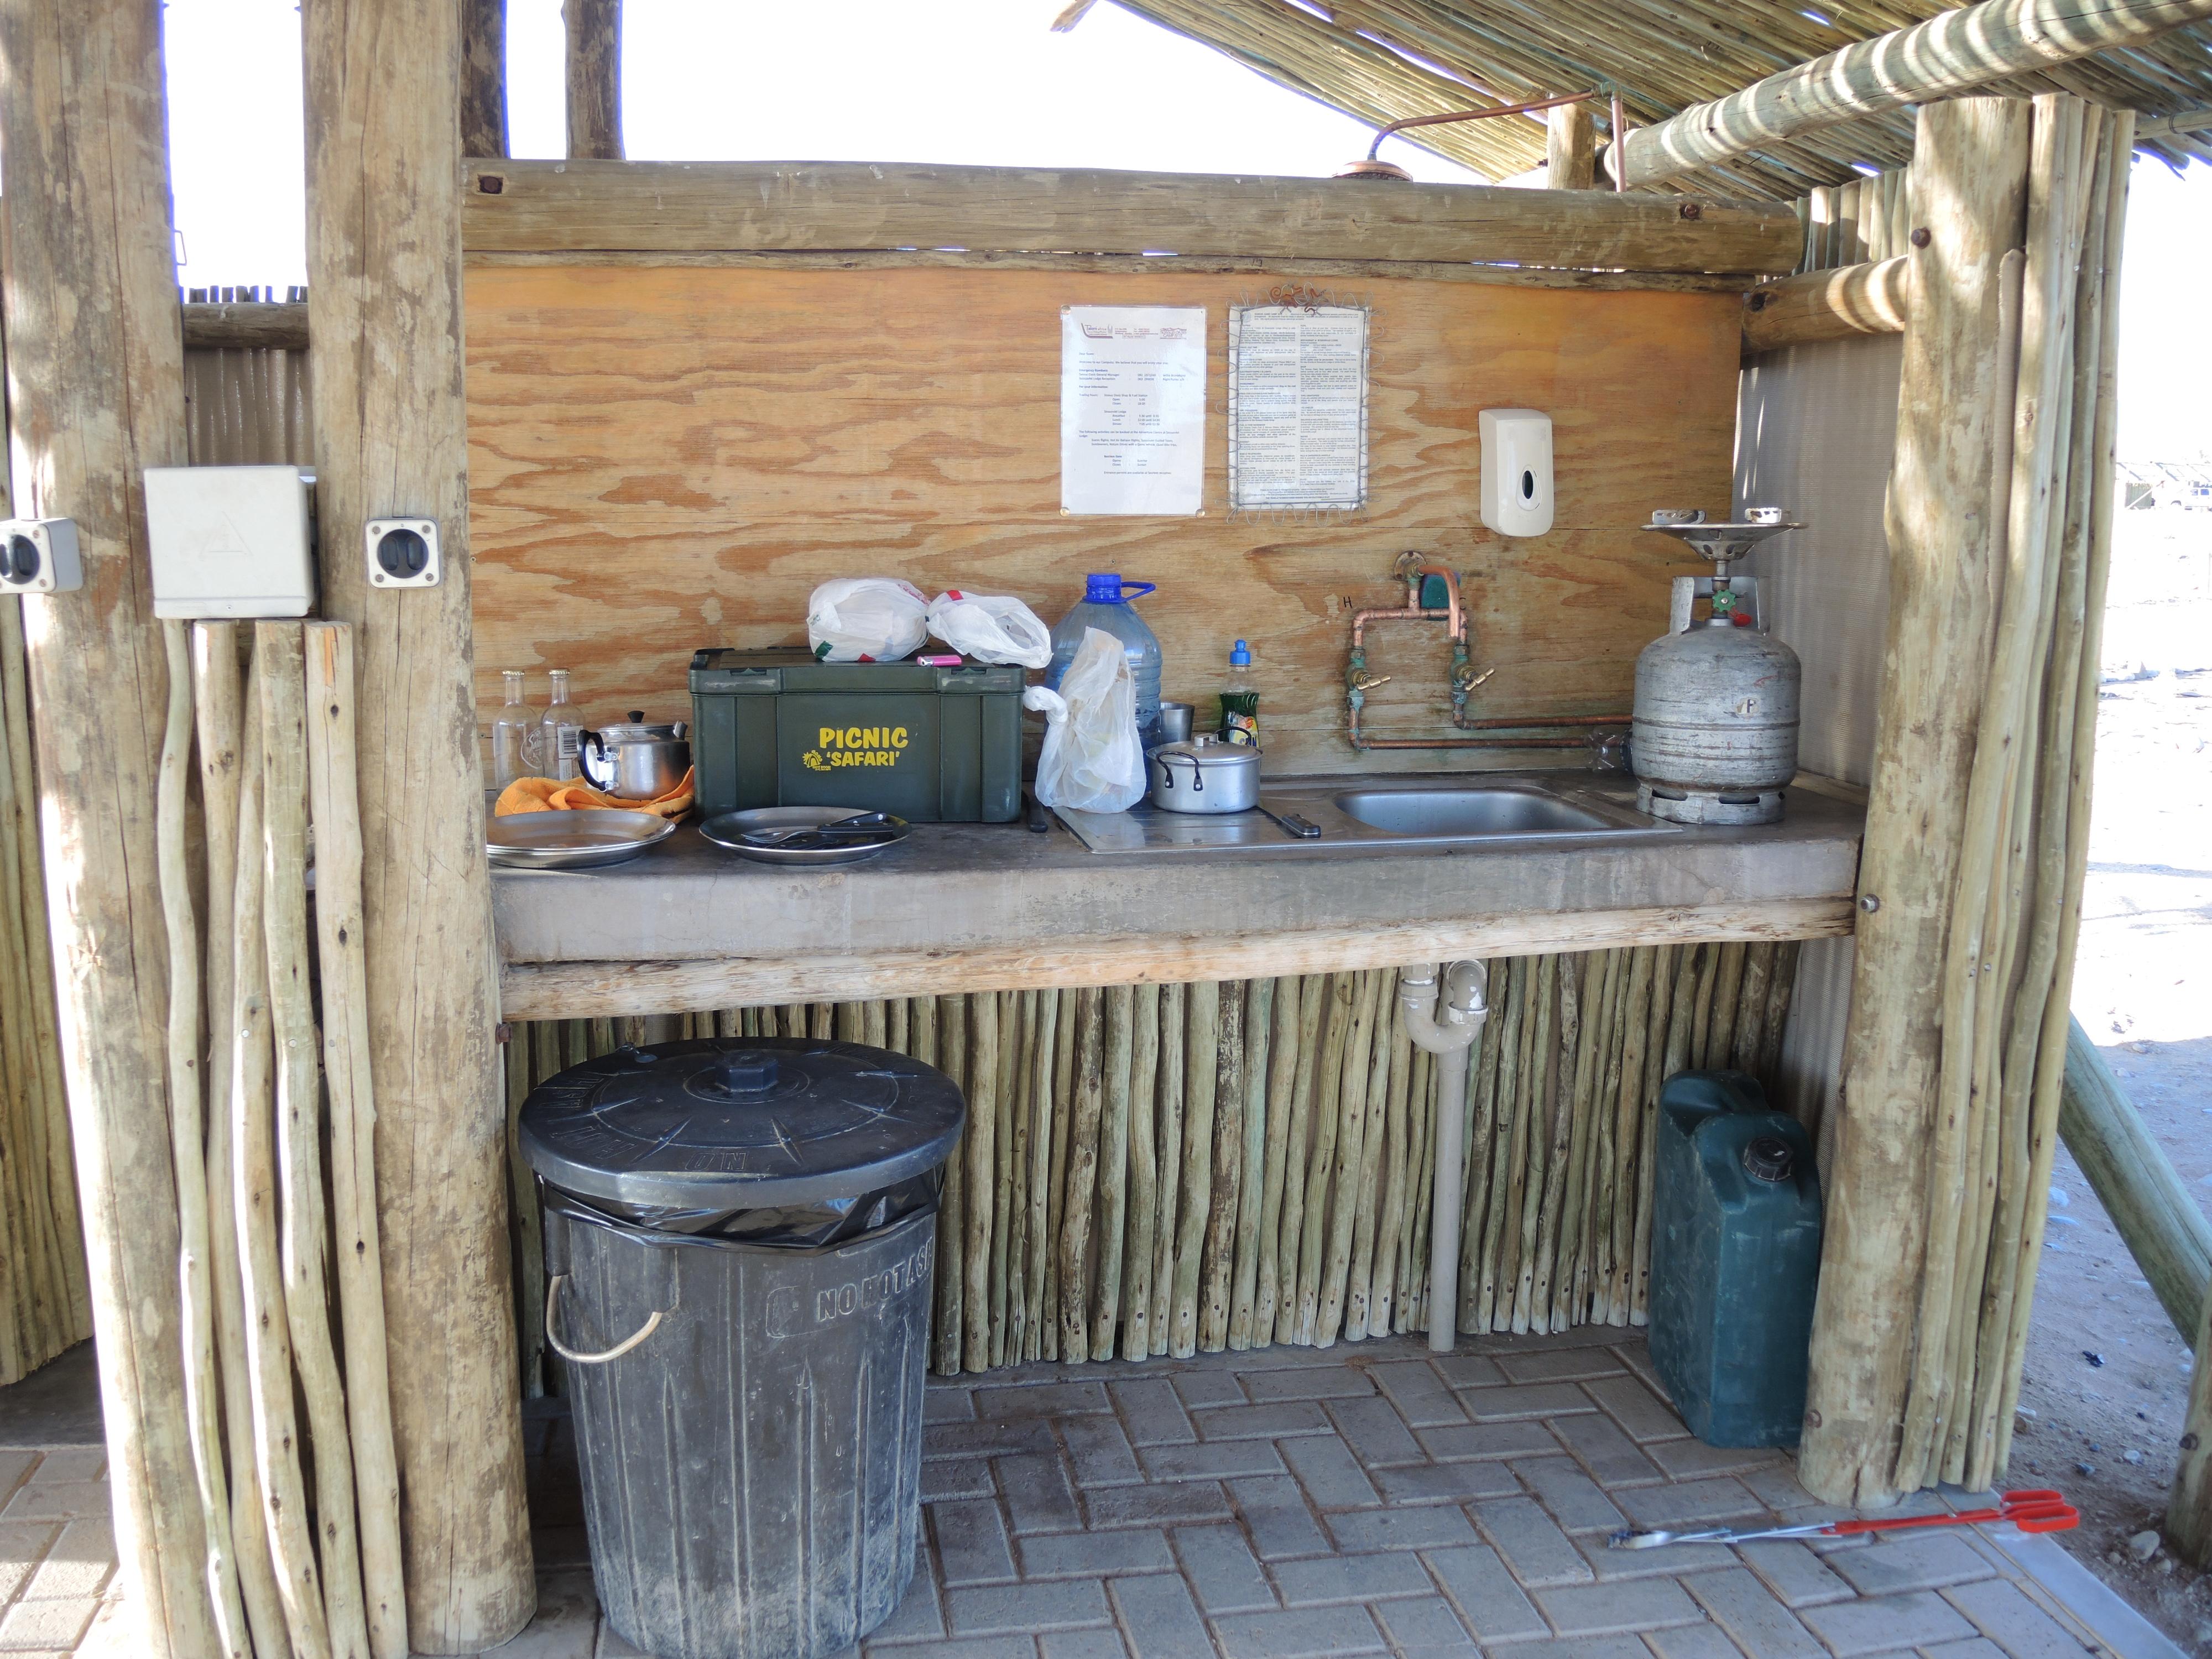 Outdoor Küche Gemauert : Outdoor küche gemauert outdoorküche gemauert mit einbau gasgrill